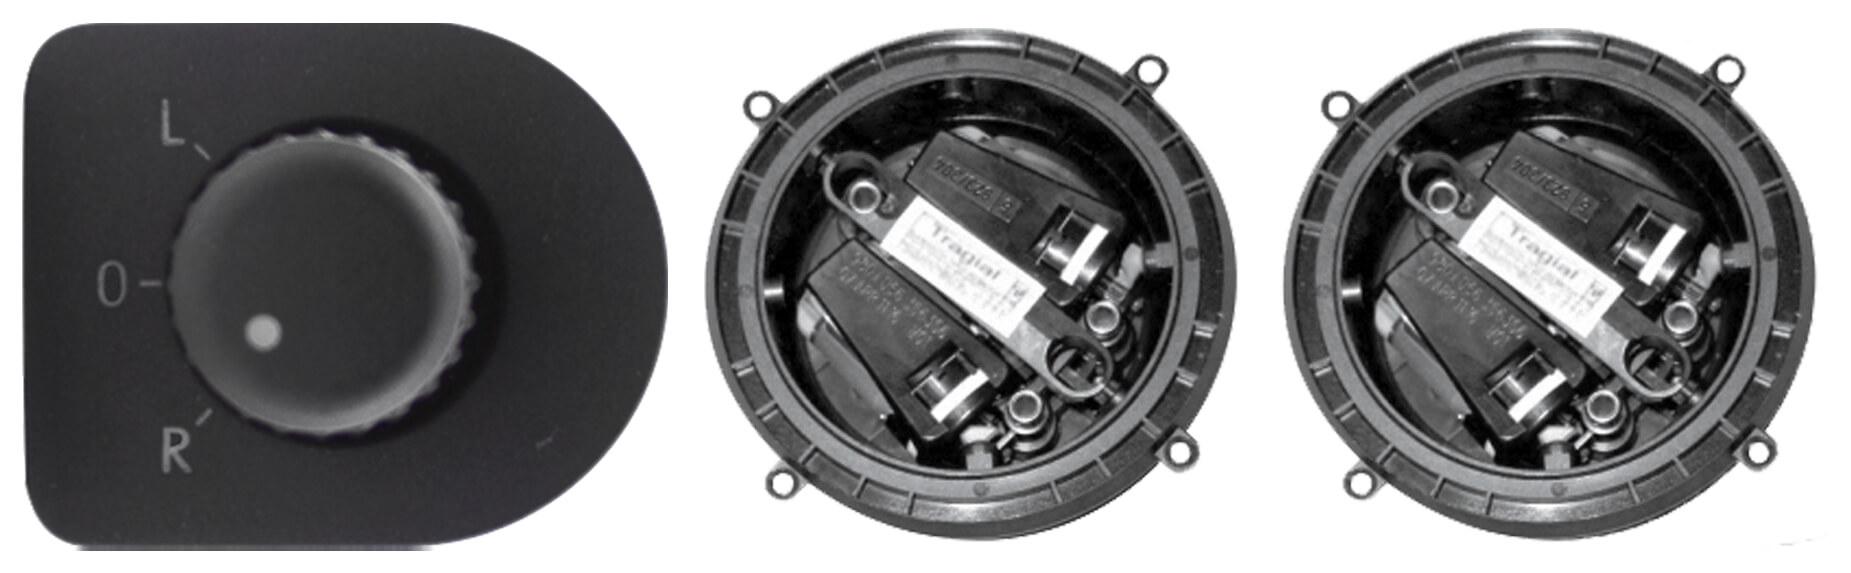 Kit Retrovisor Elétrico Sensorizado ( Tilt Down )  VW Voyage G7 4 Portas  Tragial